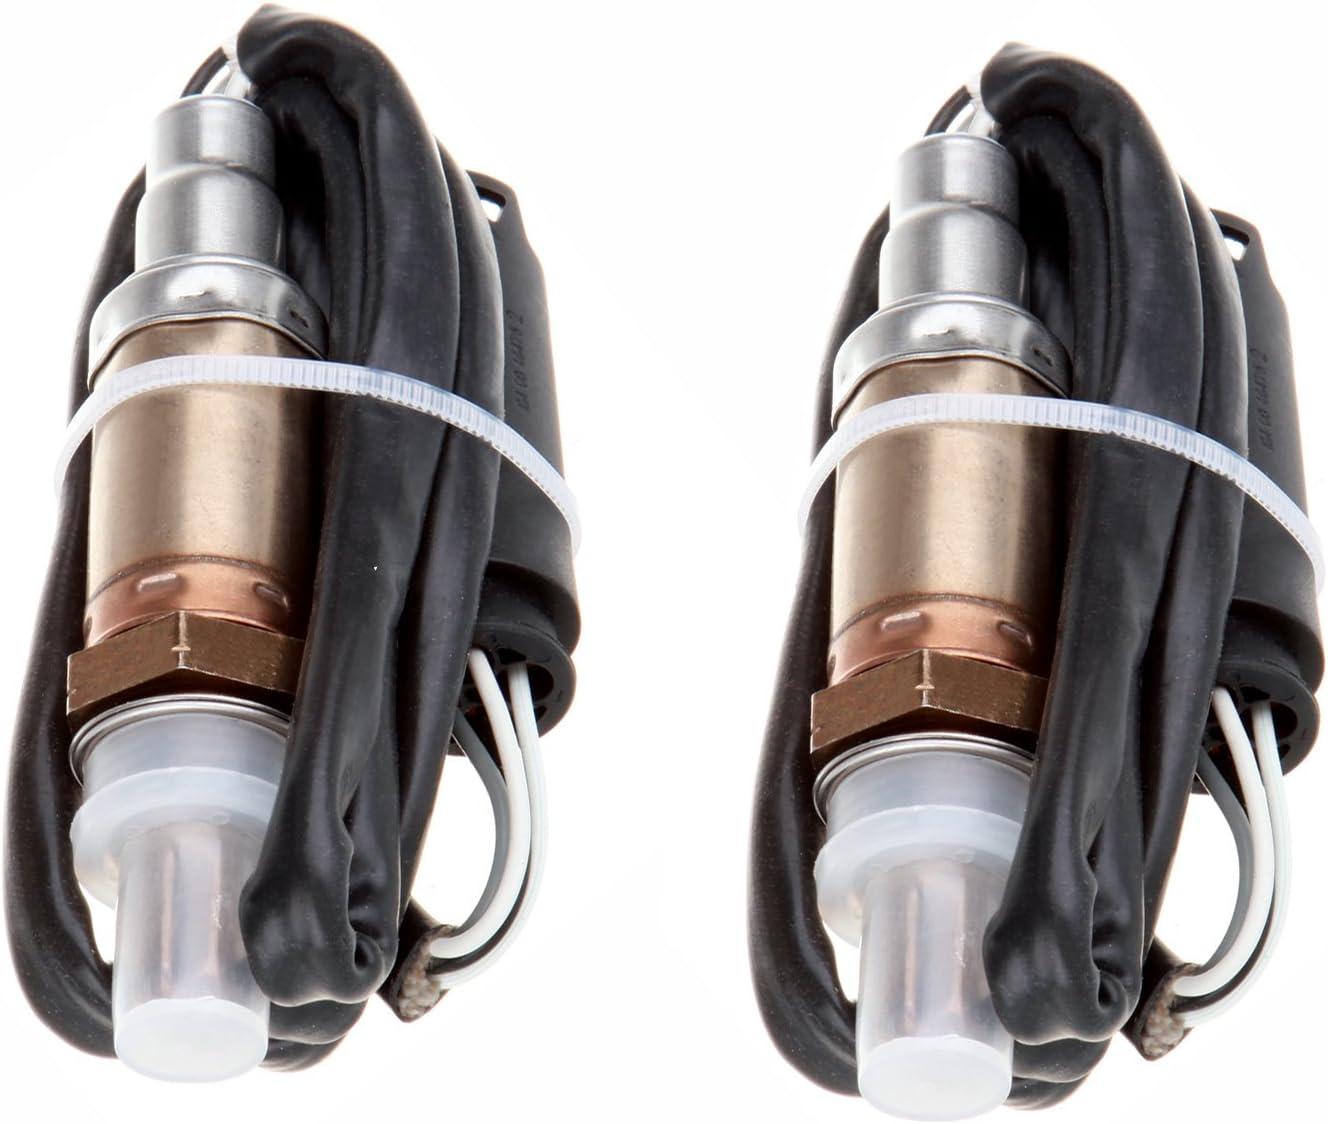 For BMW 320i 323i 325i 325xi 328i 330i 525i X3 X5 Z3 Z4 234-4683 Oxygen Sensor